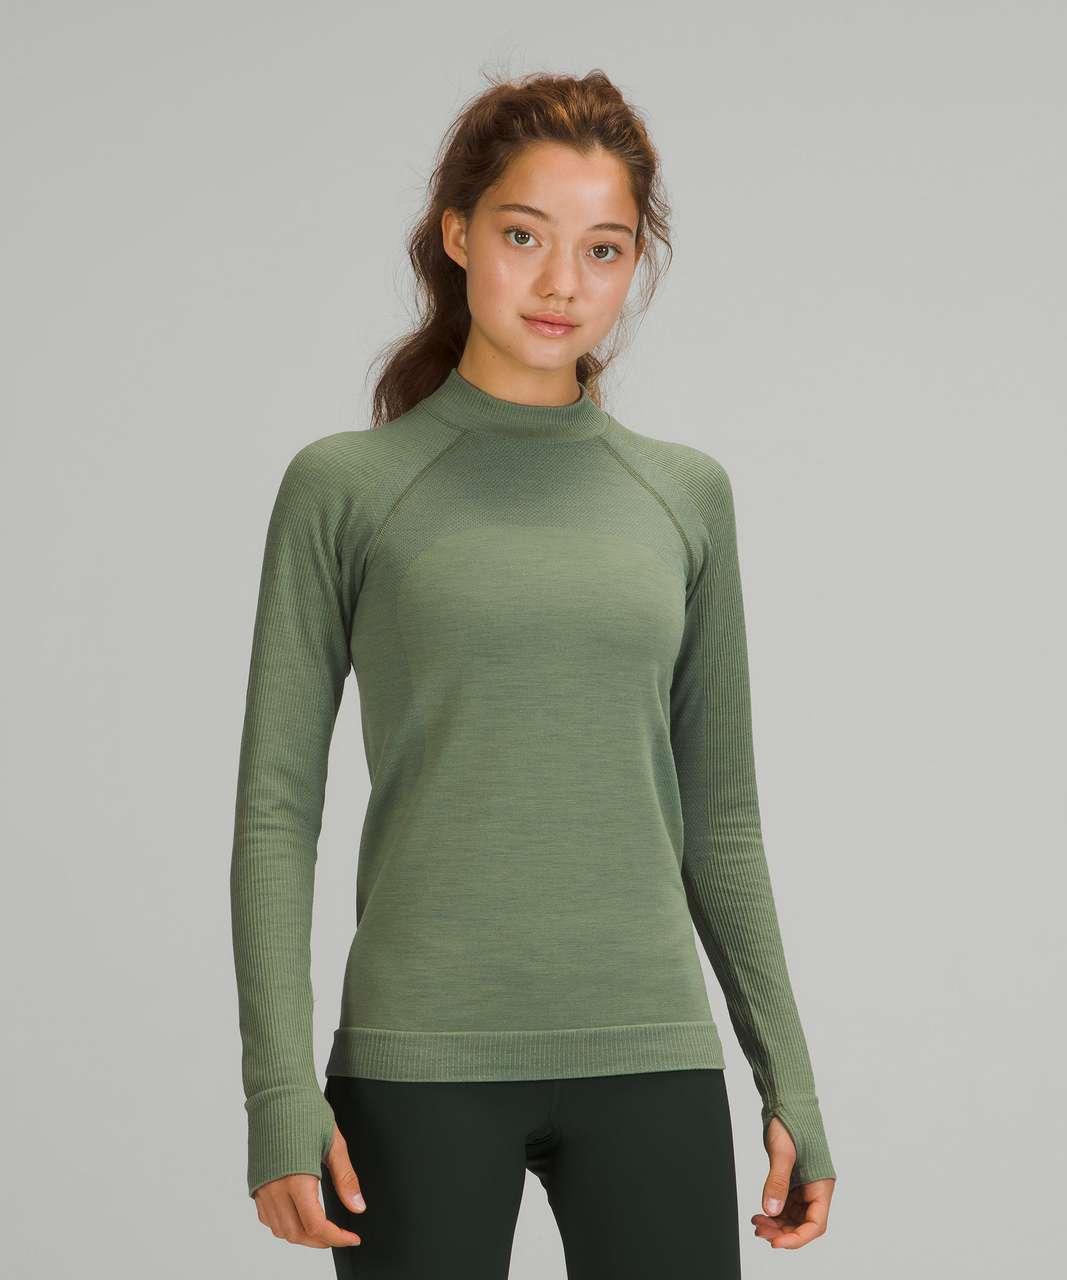 Lululemon Keep the Heat Thermal Long Sleeve Shirt - Green Twill